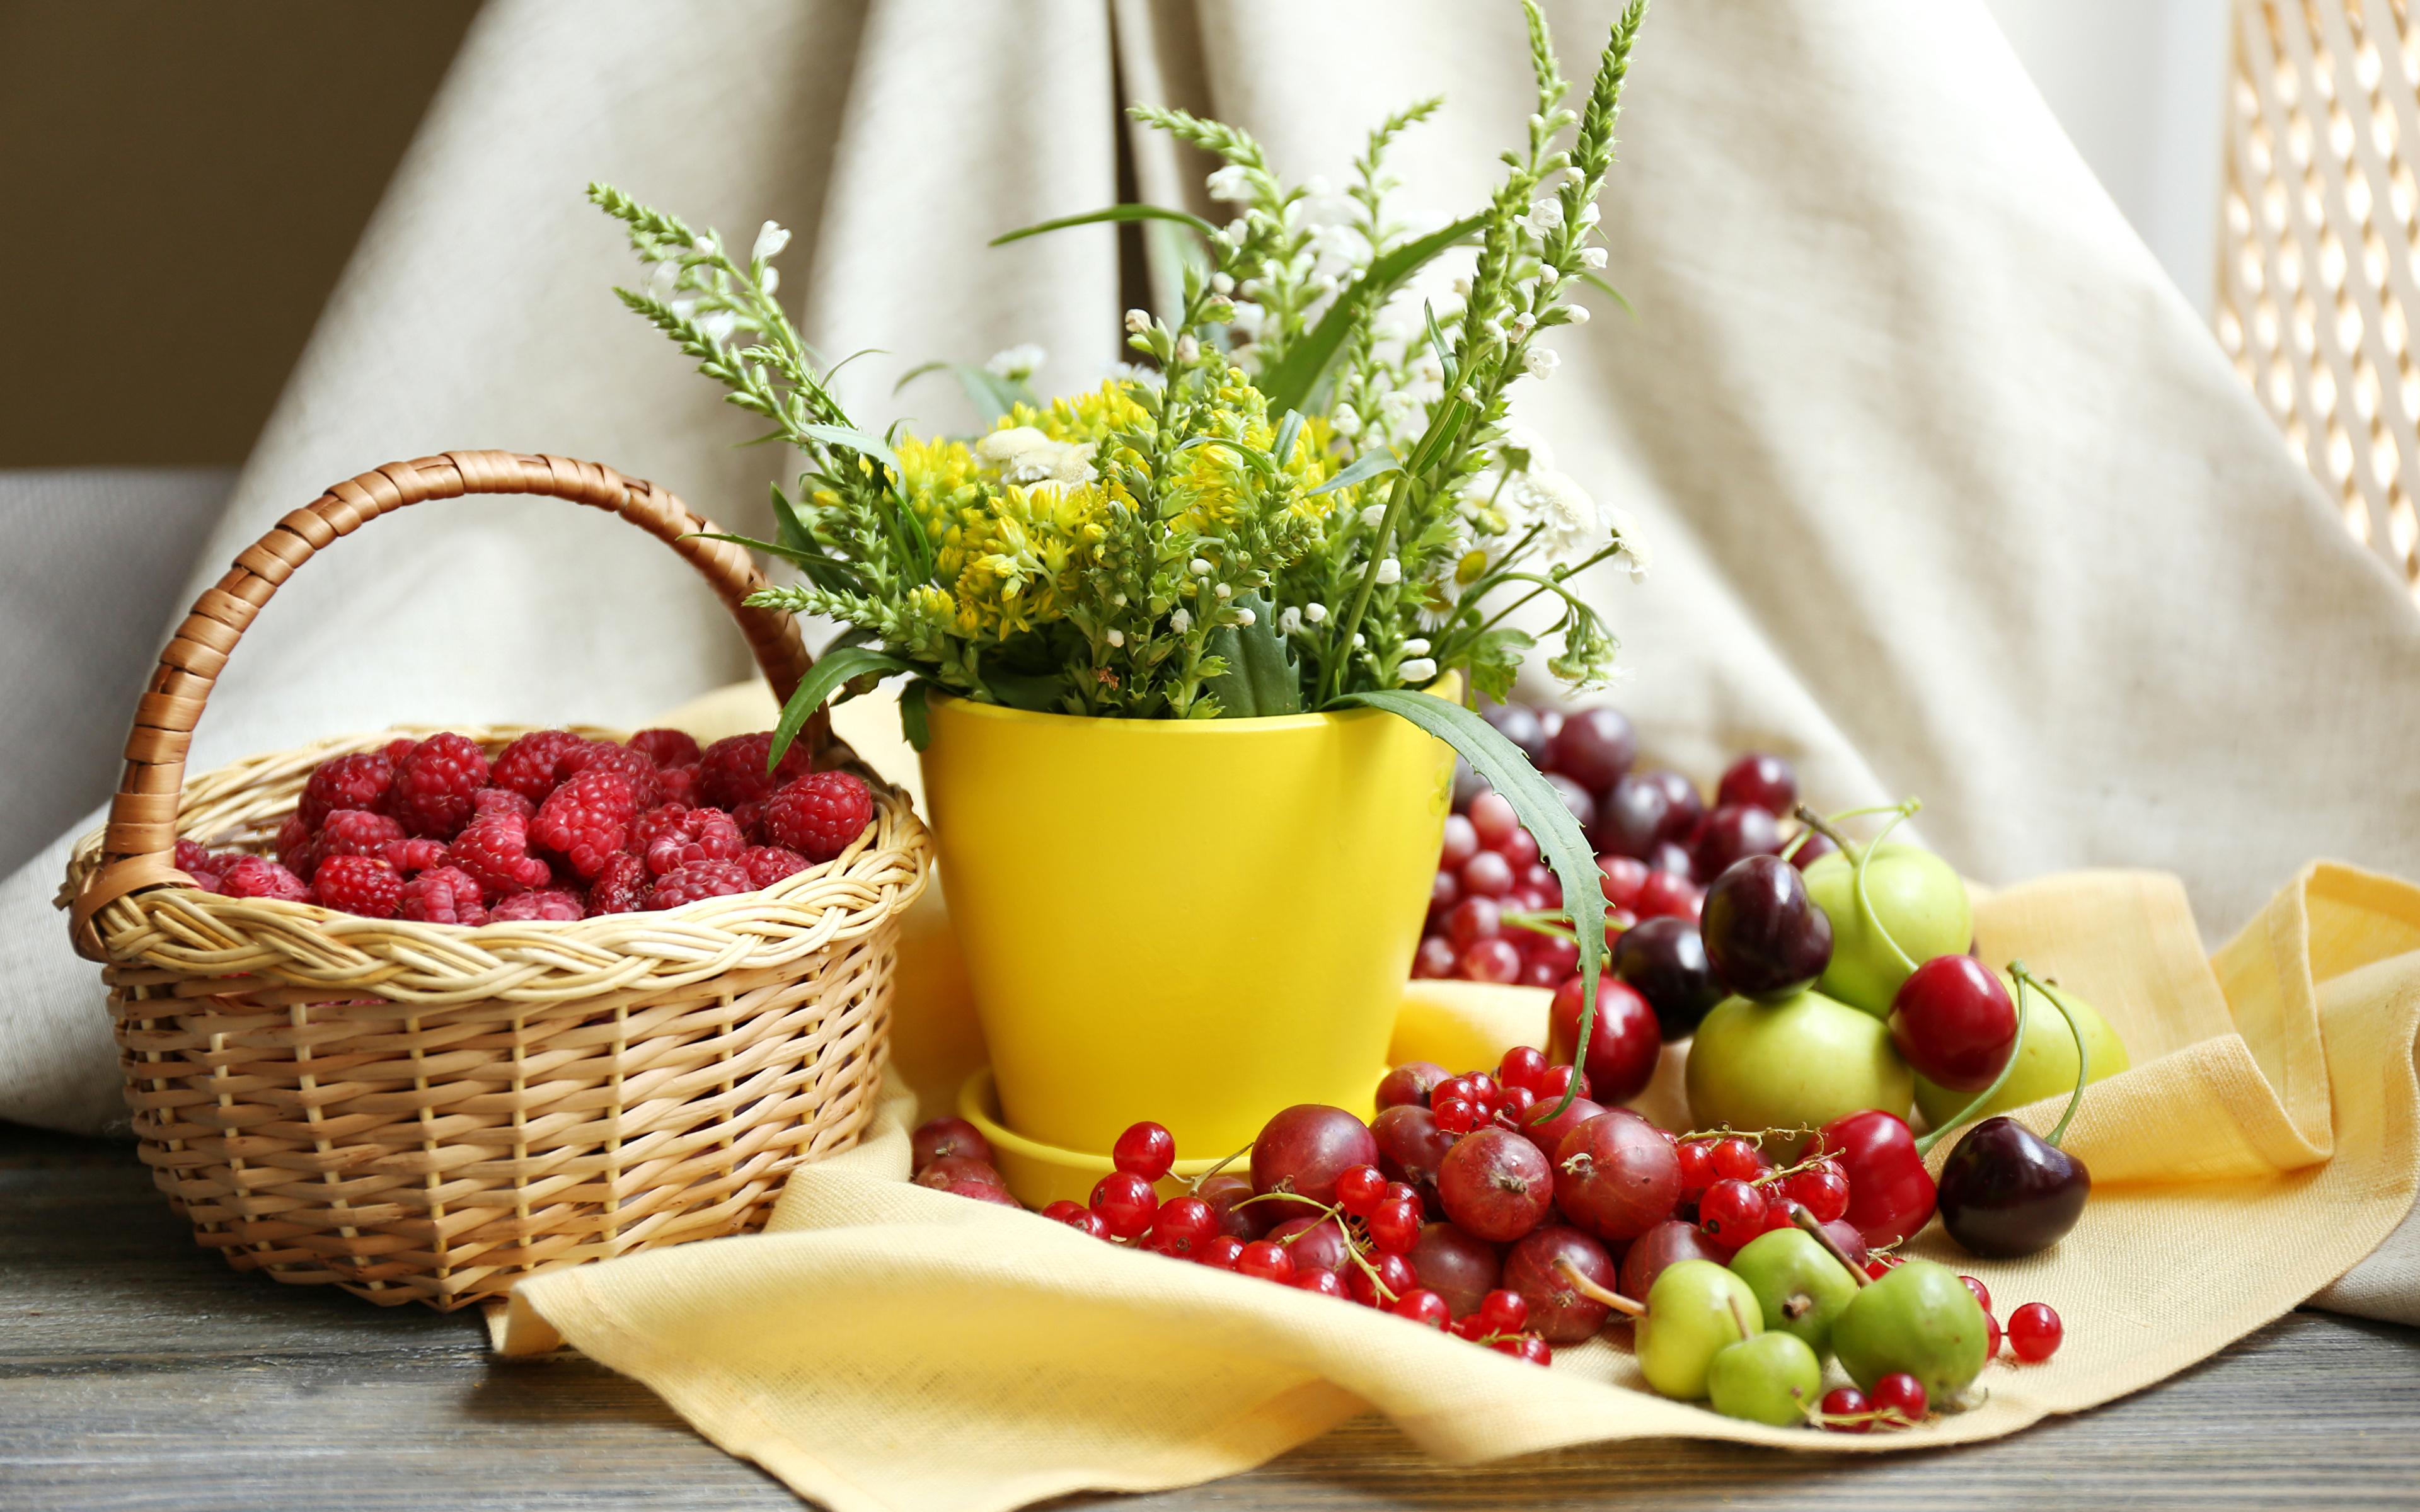 Photos Cherry Currant Flowers Raspberry foxgloves Gooseberry Wicker basket Food Still-life 3840x2400 flower Digitalis